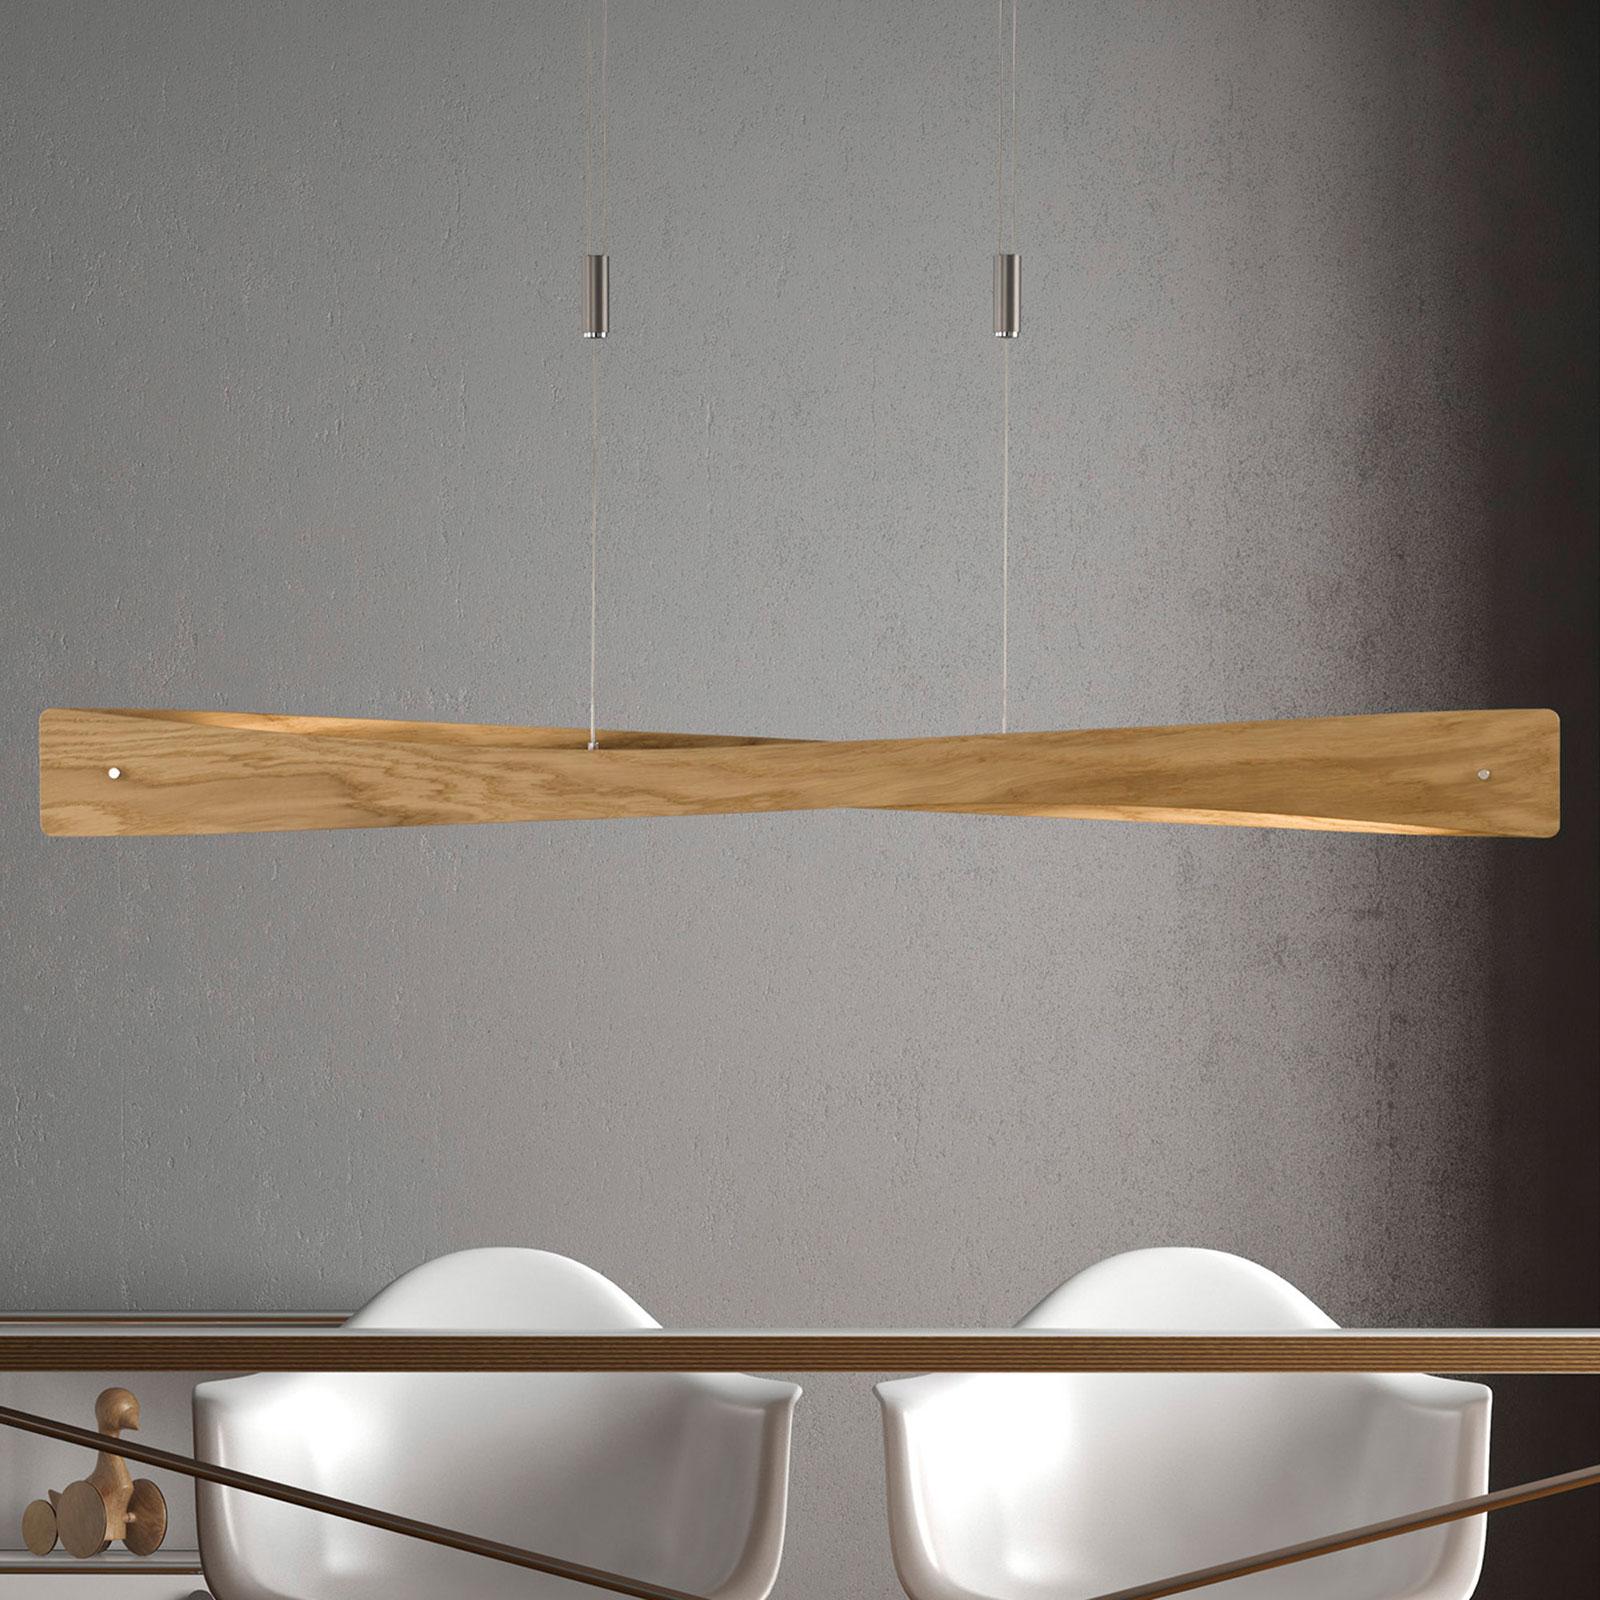 Lucande Lian LED-riippuvalaisin, tammi